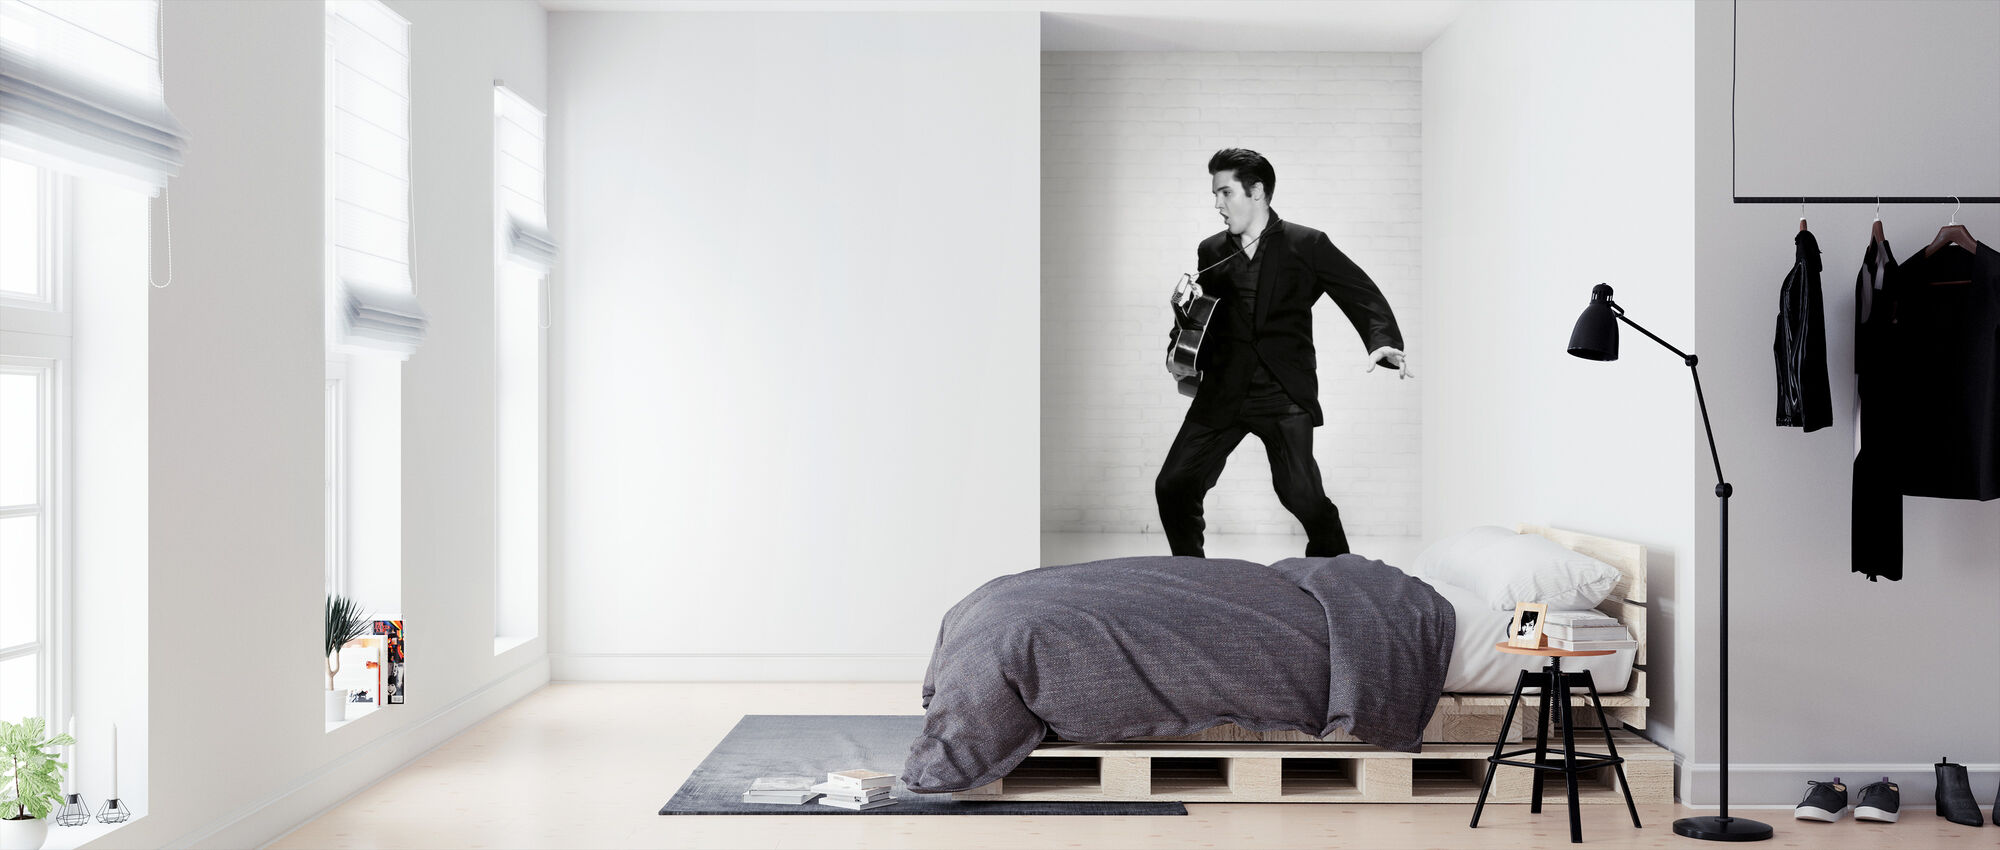 Elvis Presley - Tapet - Soverom